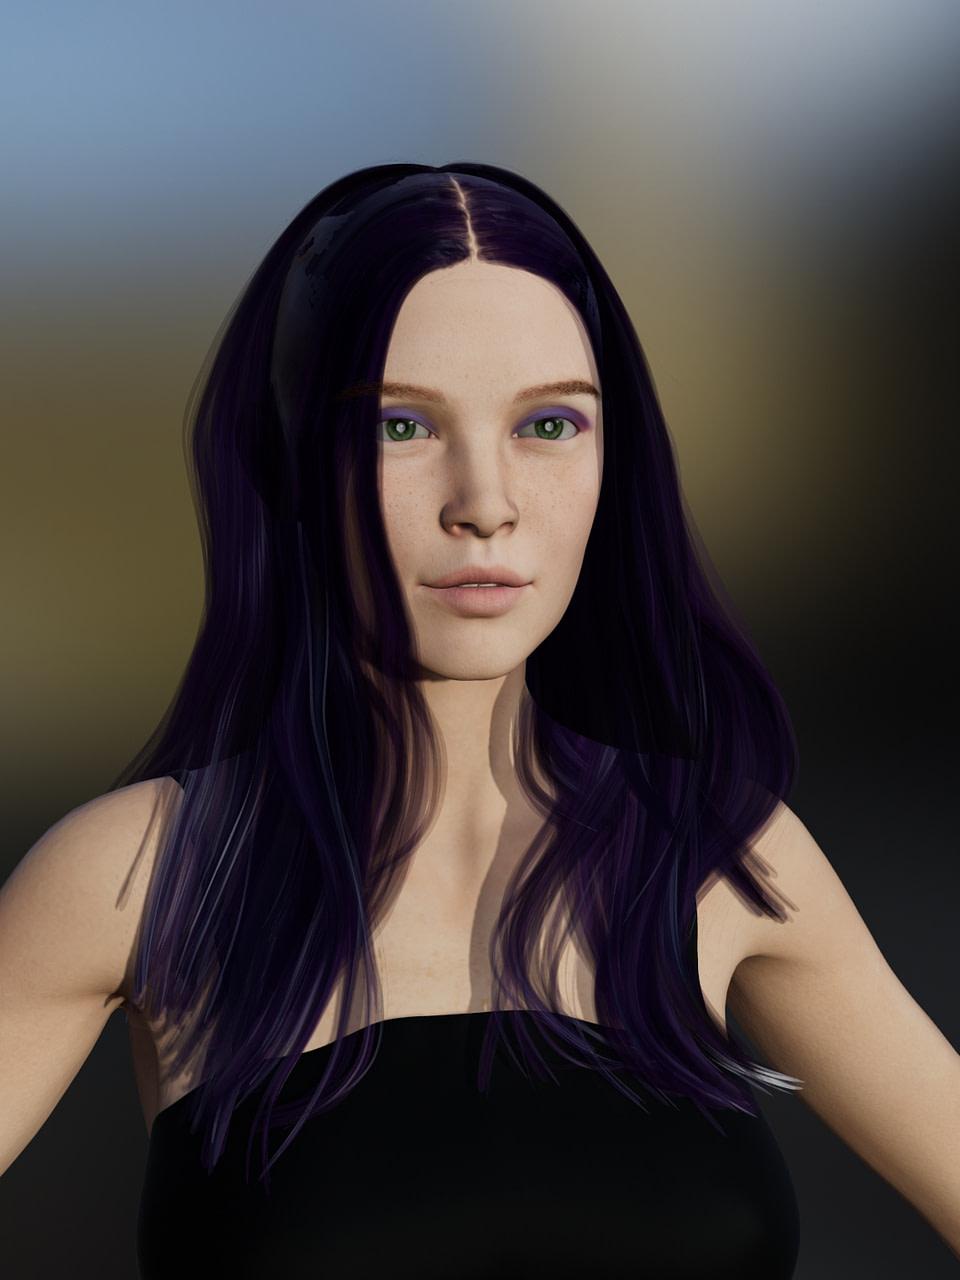 daz 3d female genesis 8 model filament render hair texture